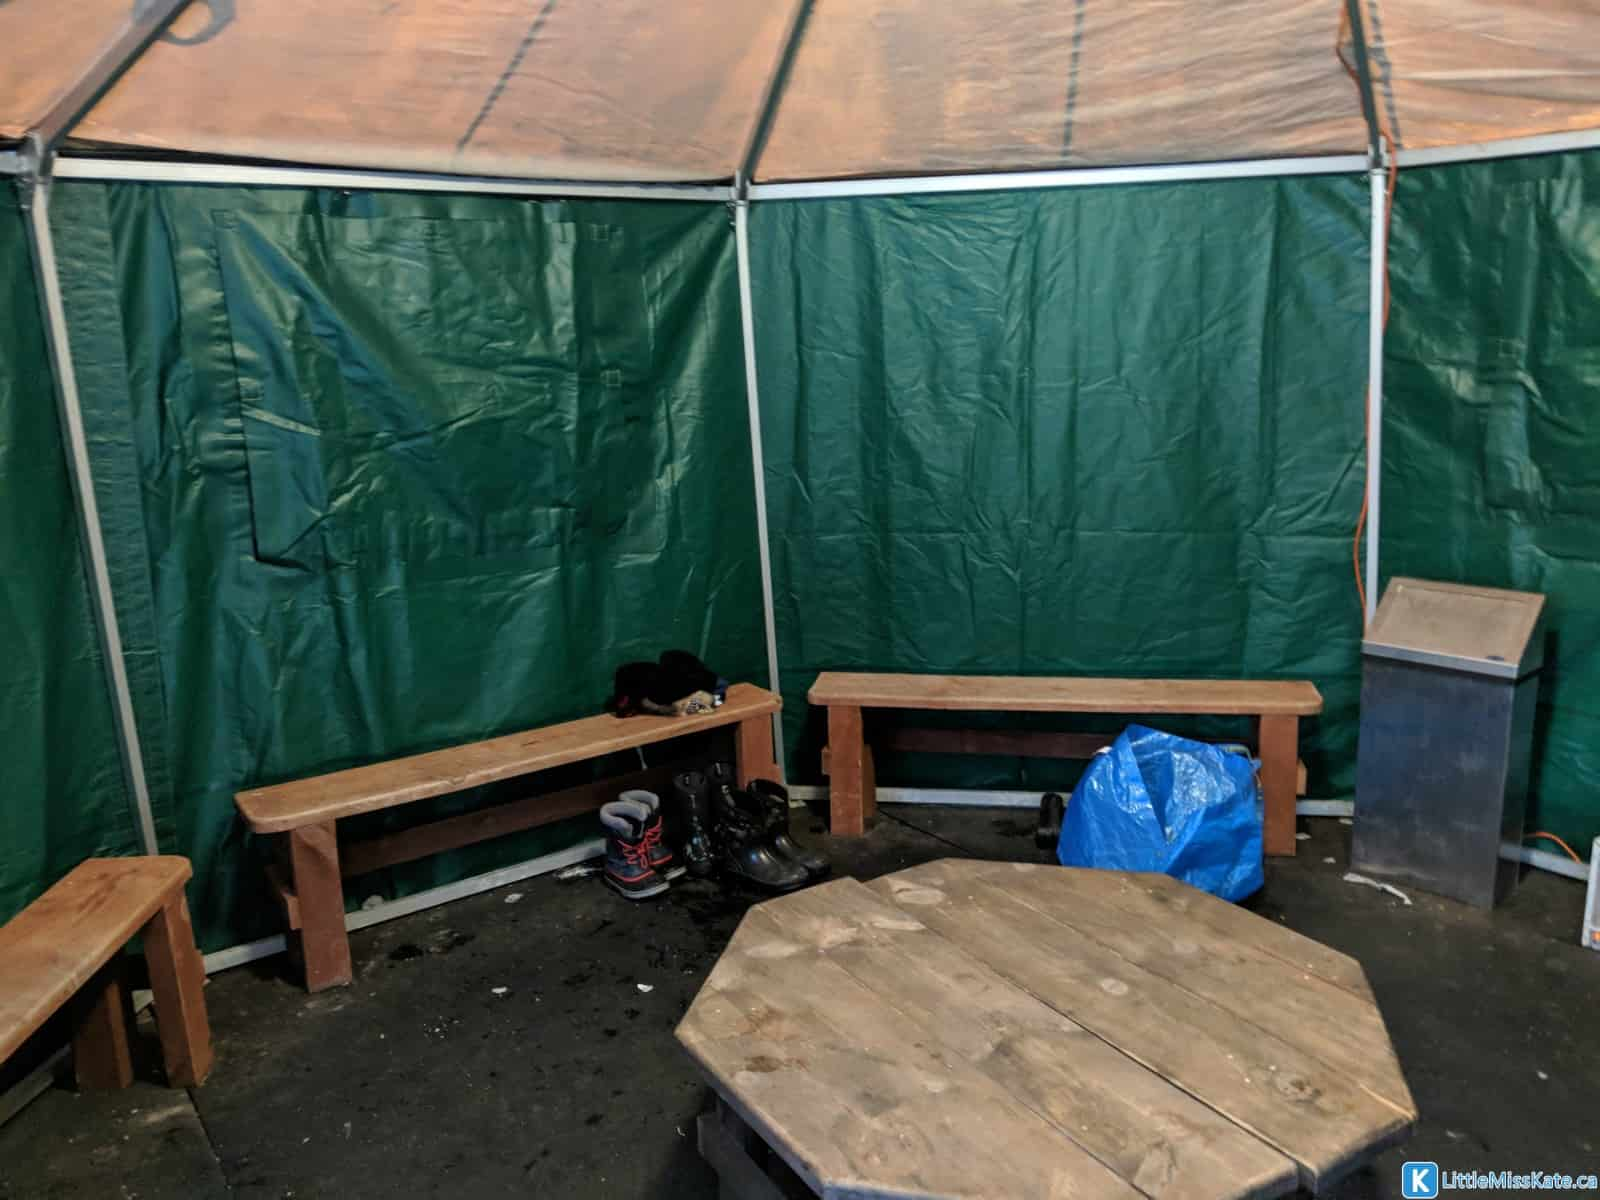 MacGregor Point skating outdoor ice skate trail yurt ontario